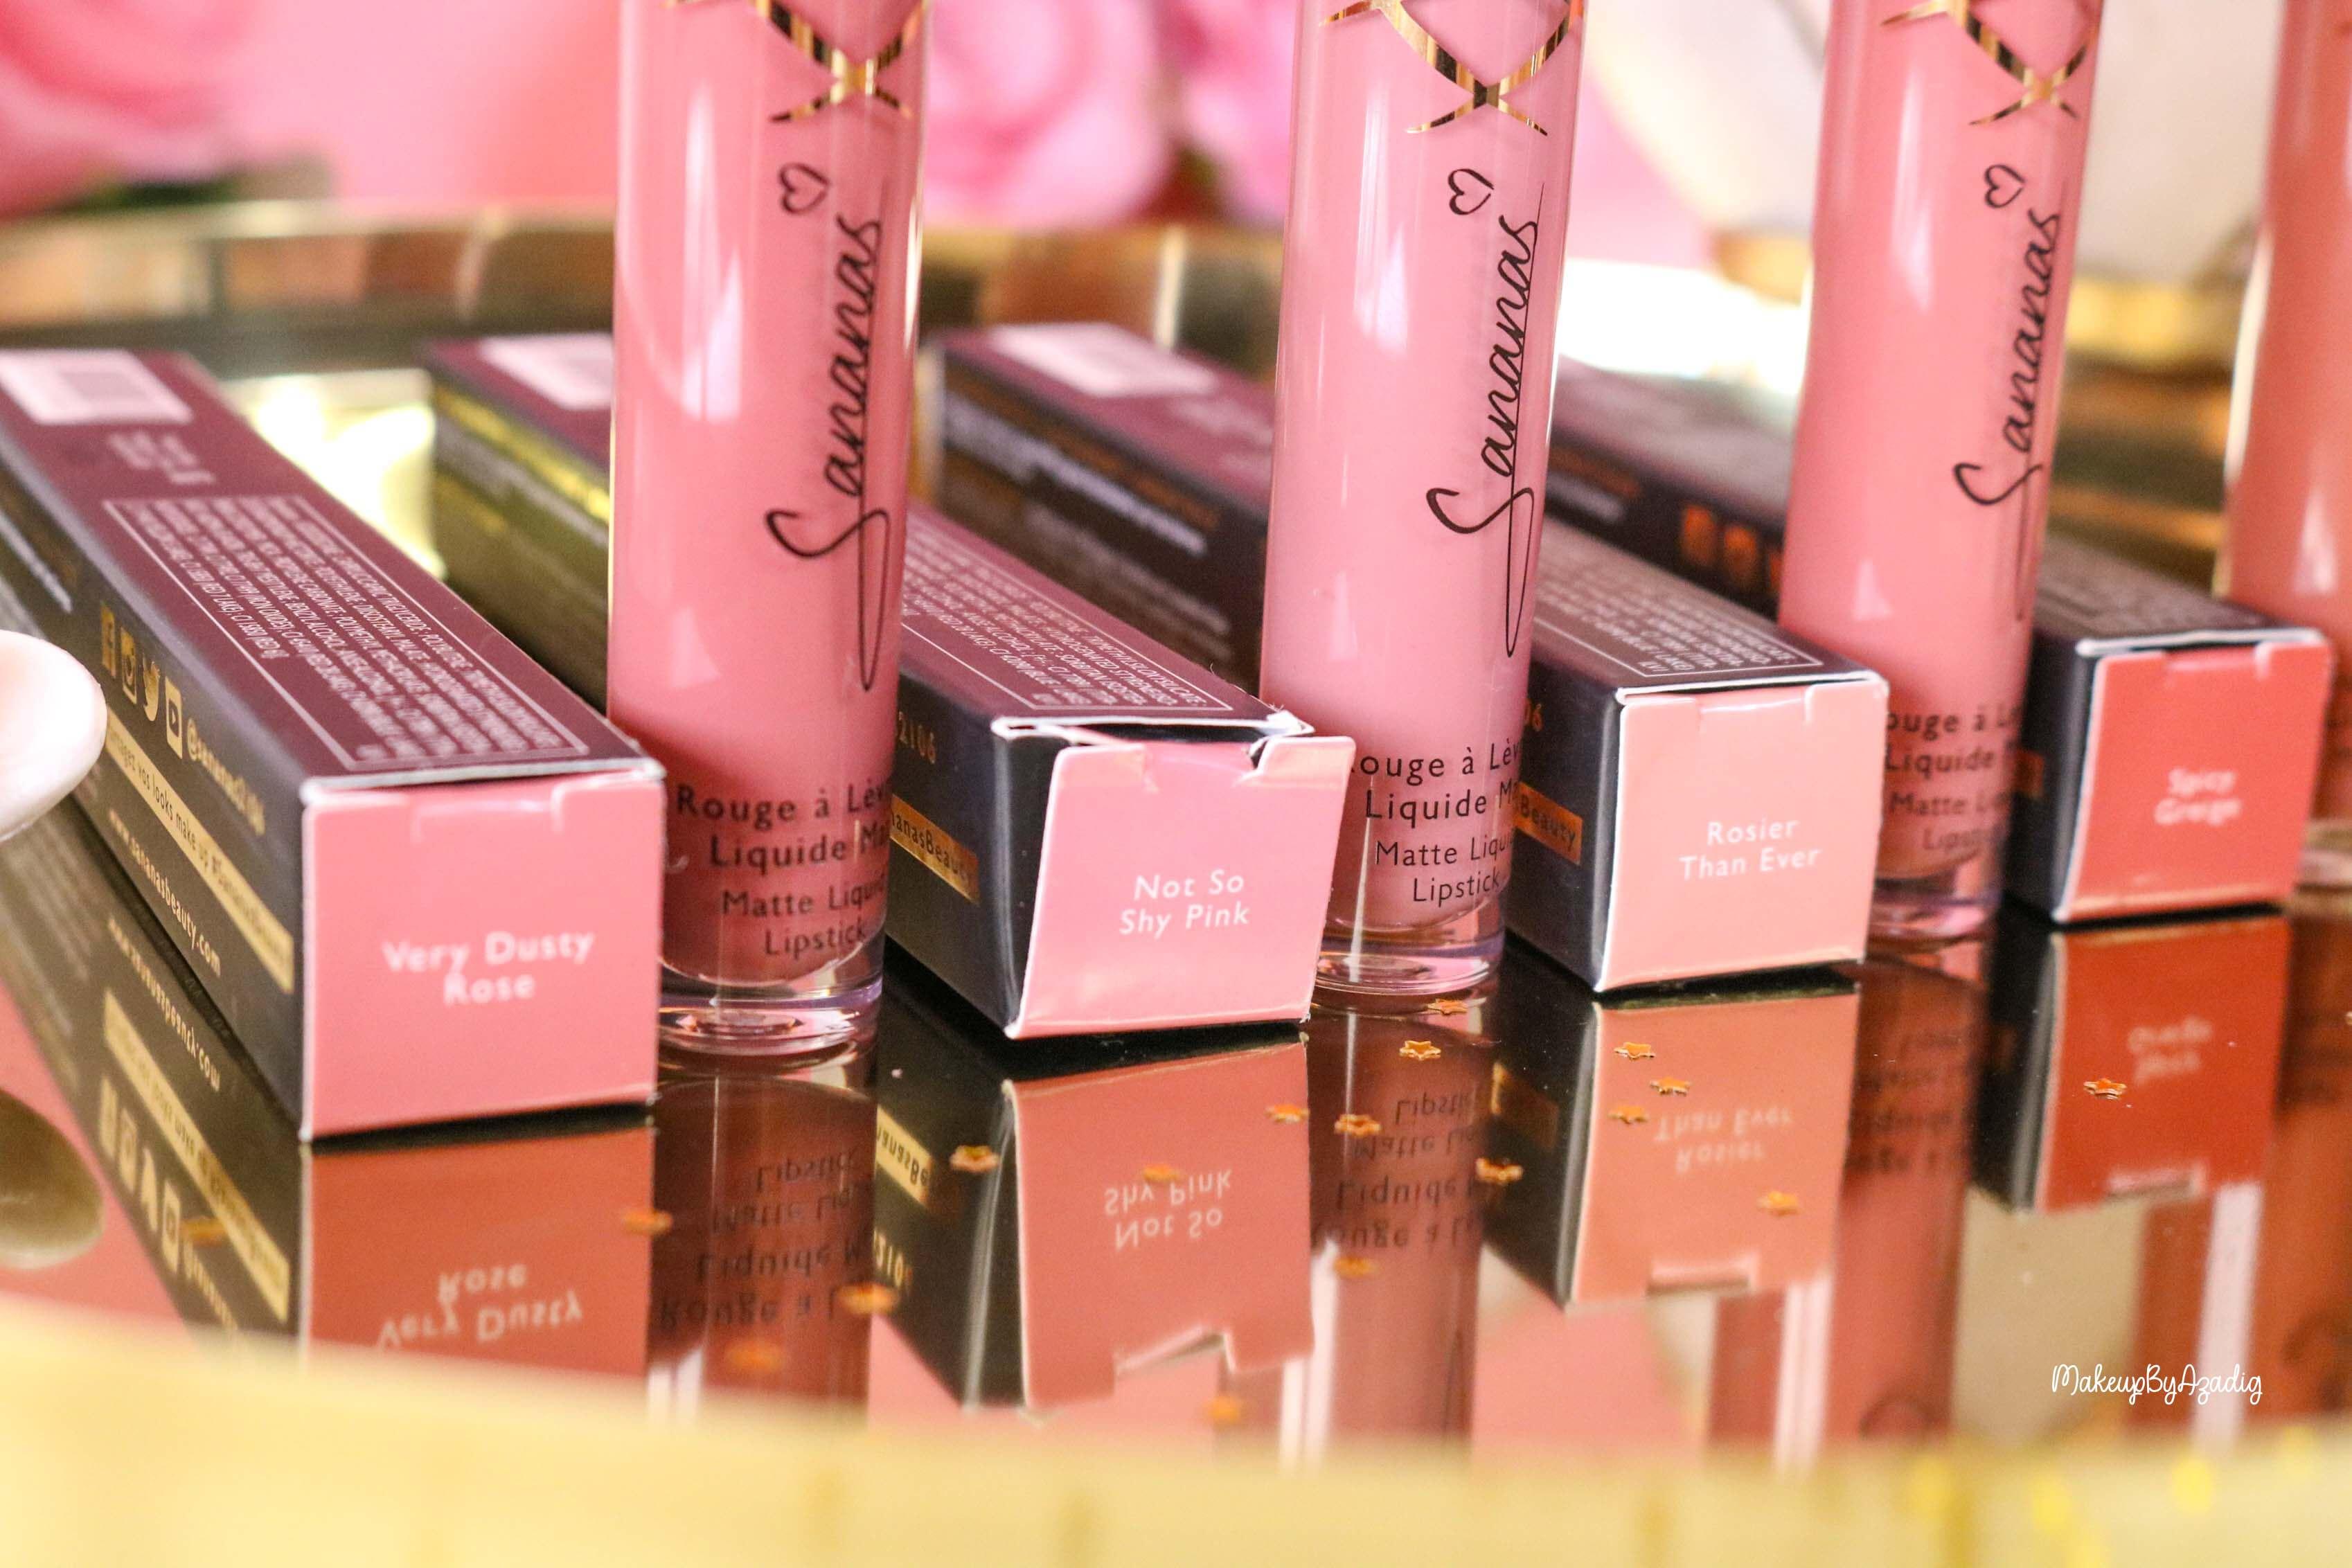 revue-marque-sananas-beauty-rouge-a-levres-vernis-kit-avis-prix-amazon-makeupbyazadig-dusty-pink-greige-rosier-couleurs